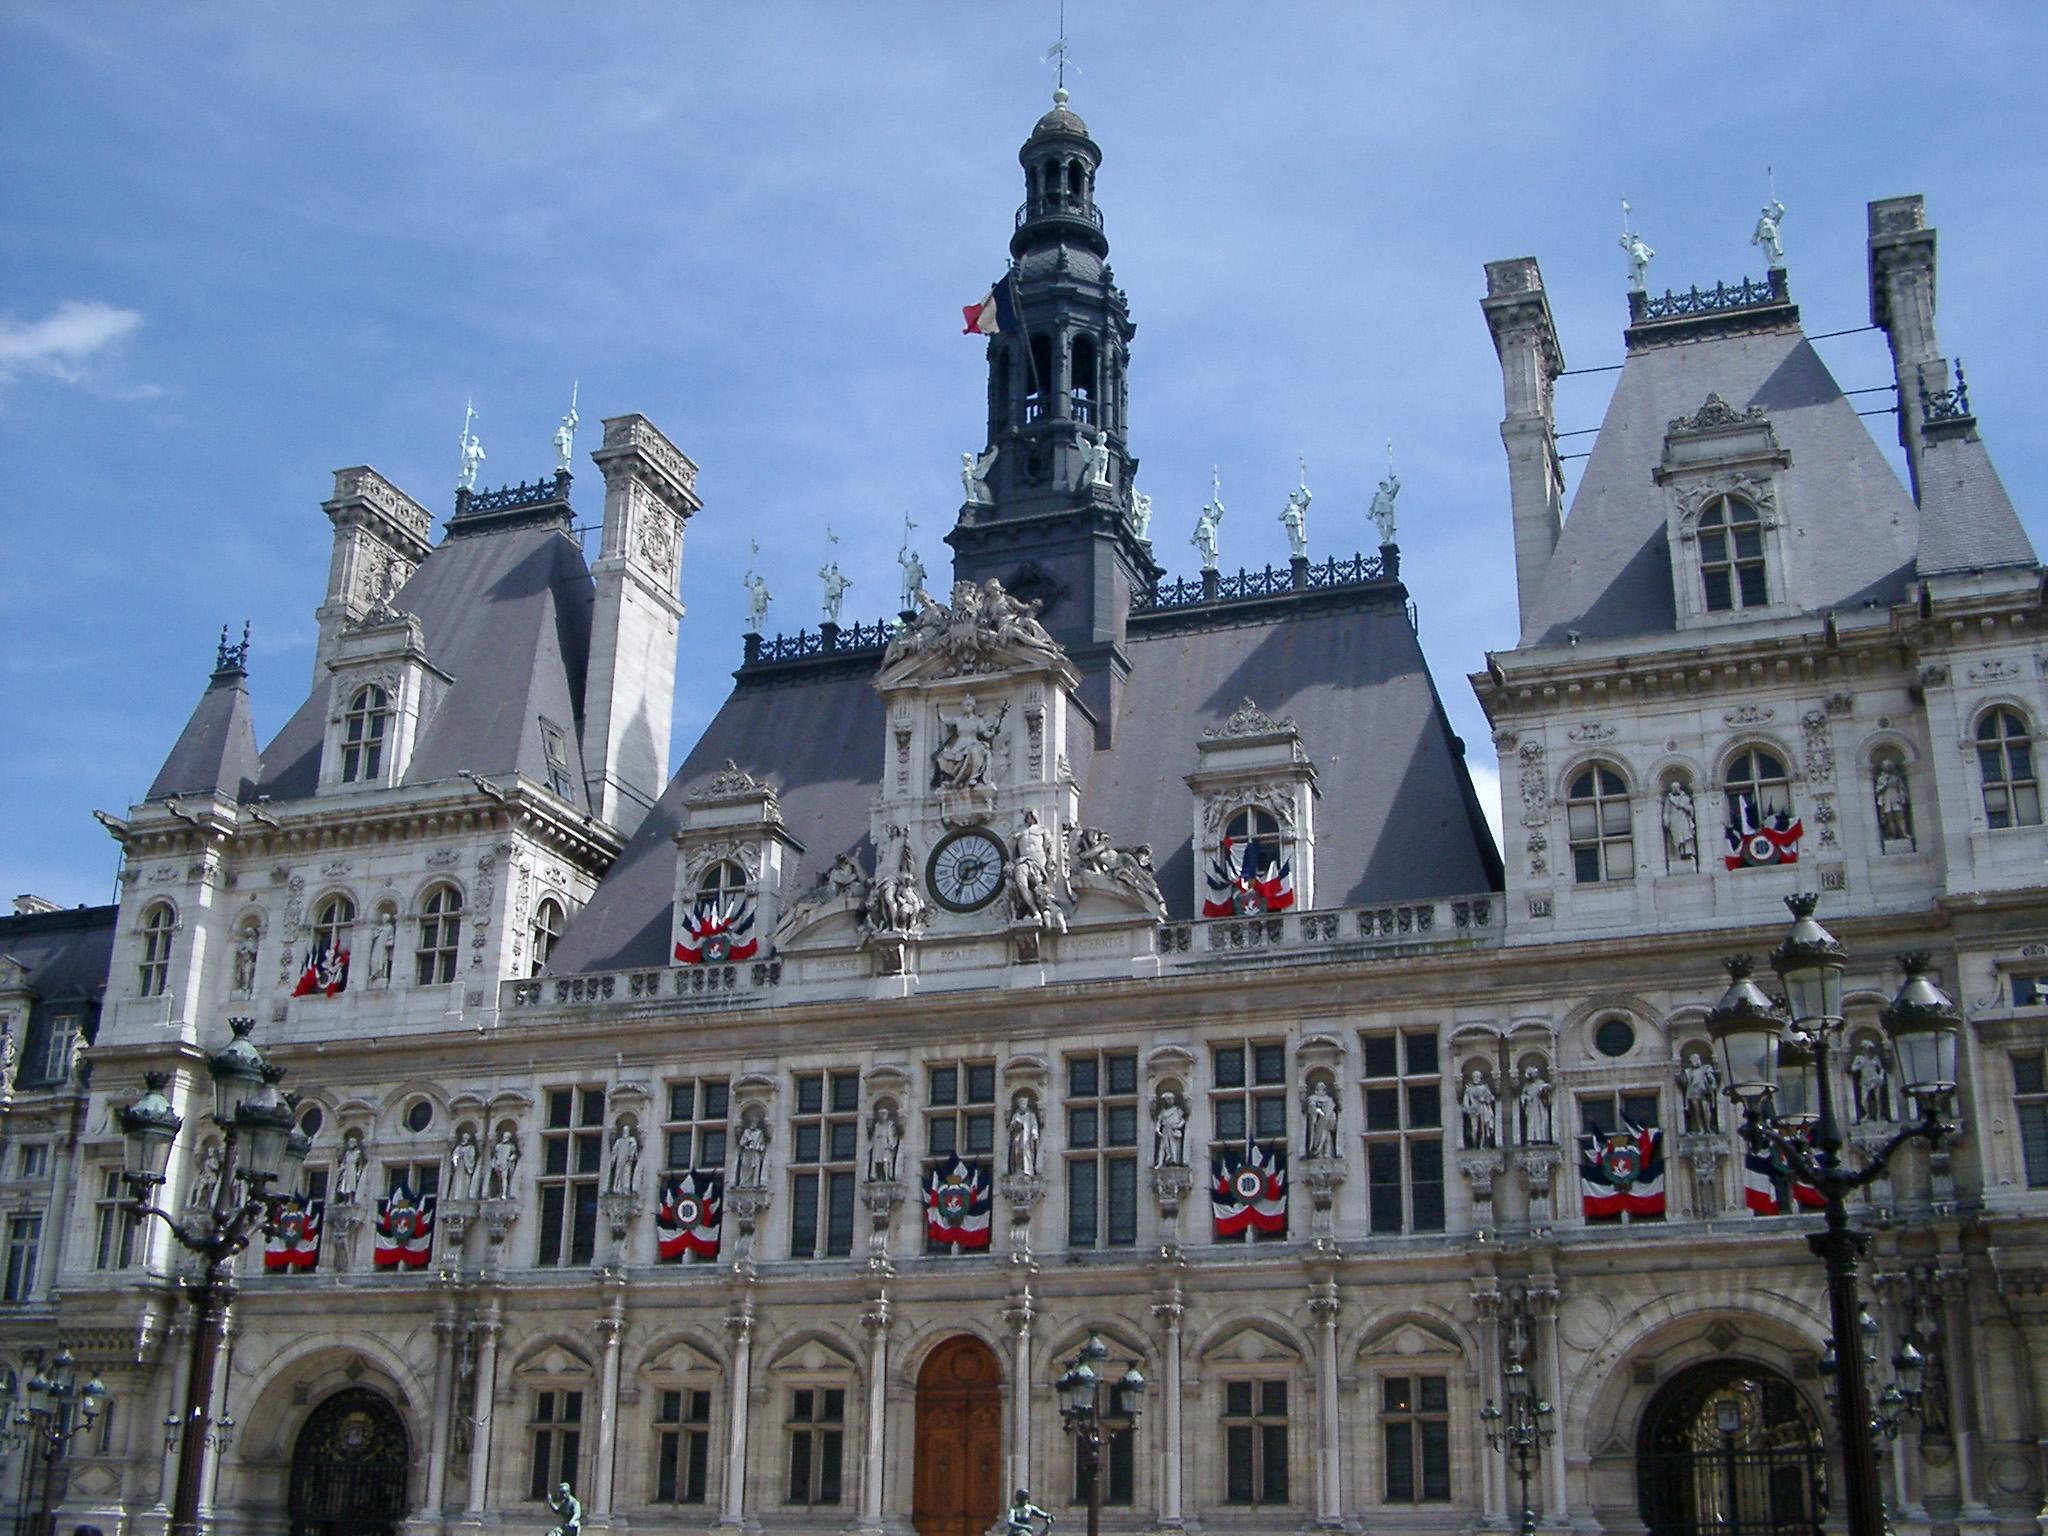 Exterior Of Hotel De Ville Administrative Building In Paris France